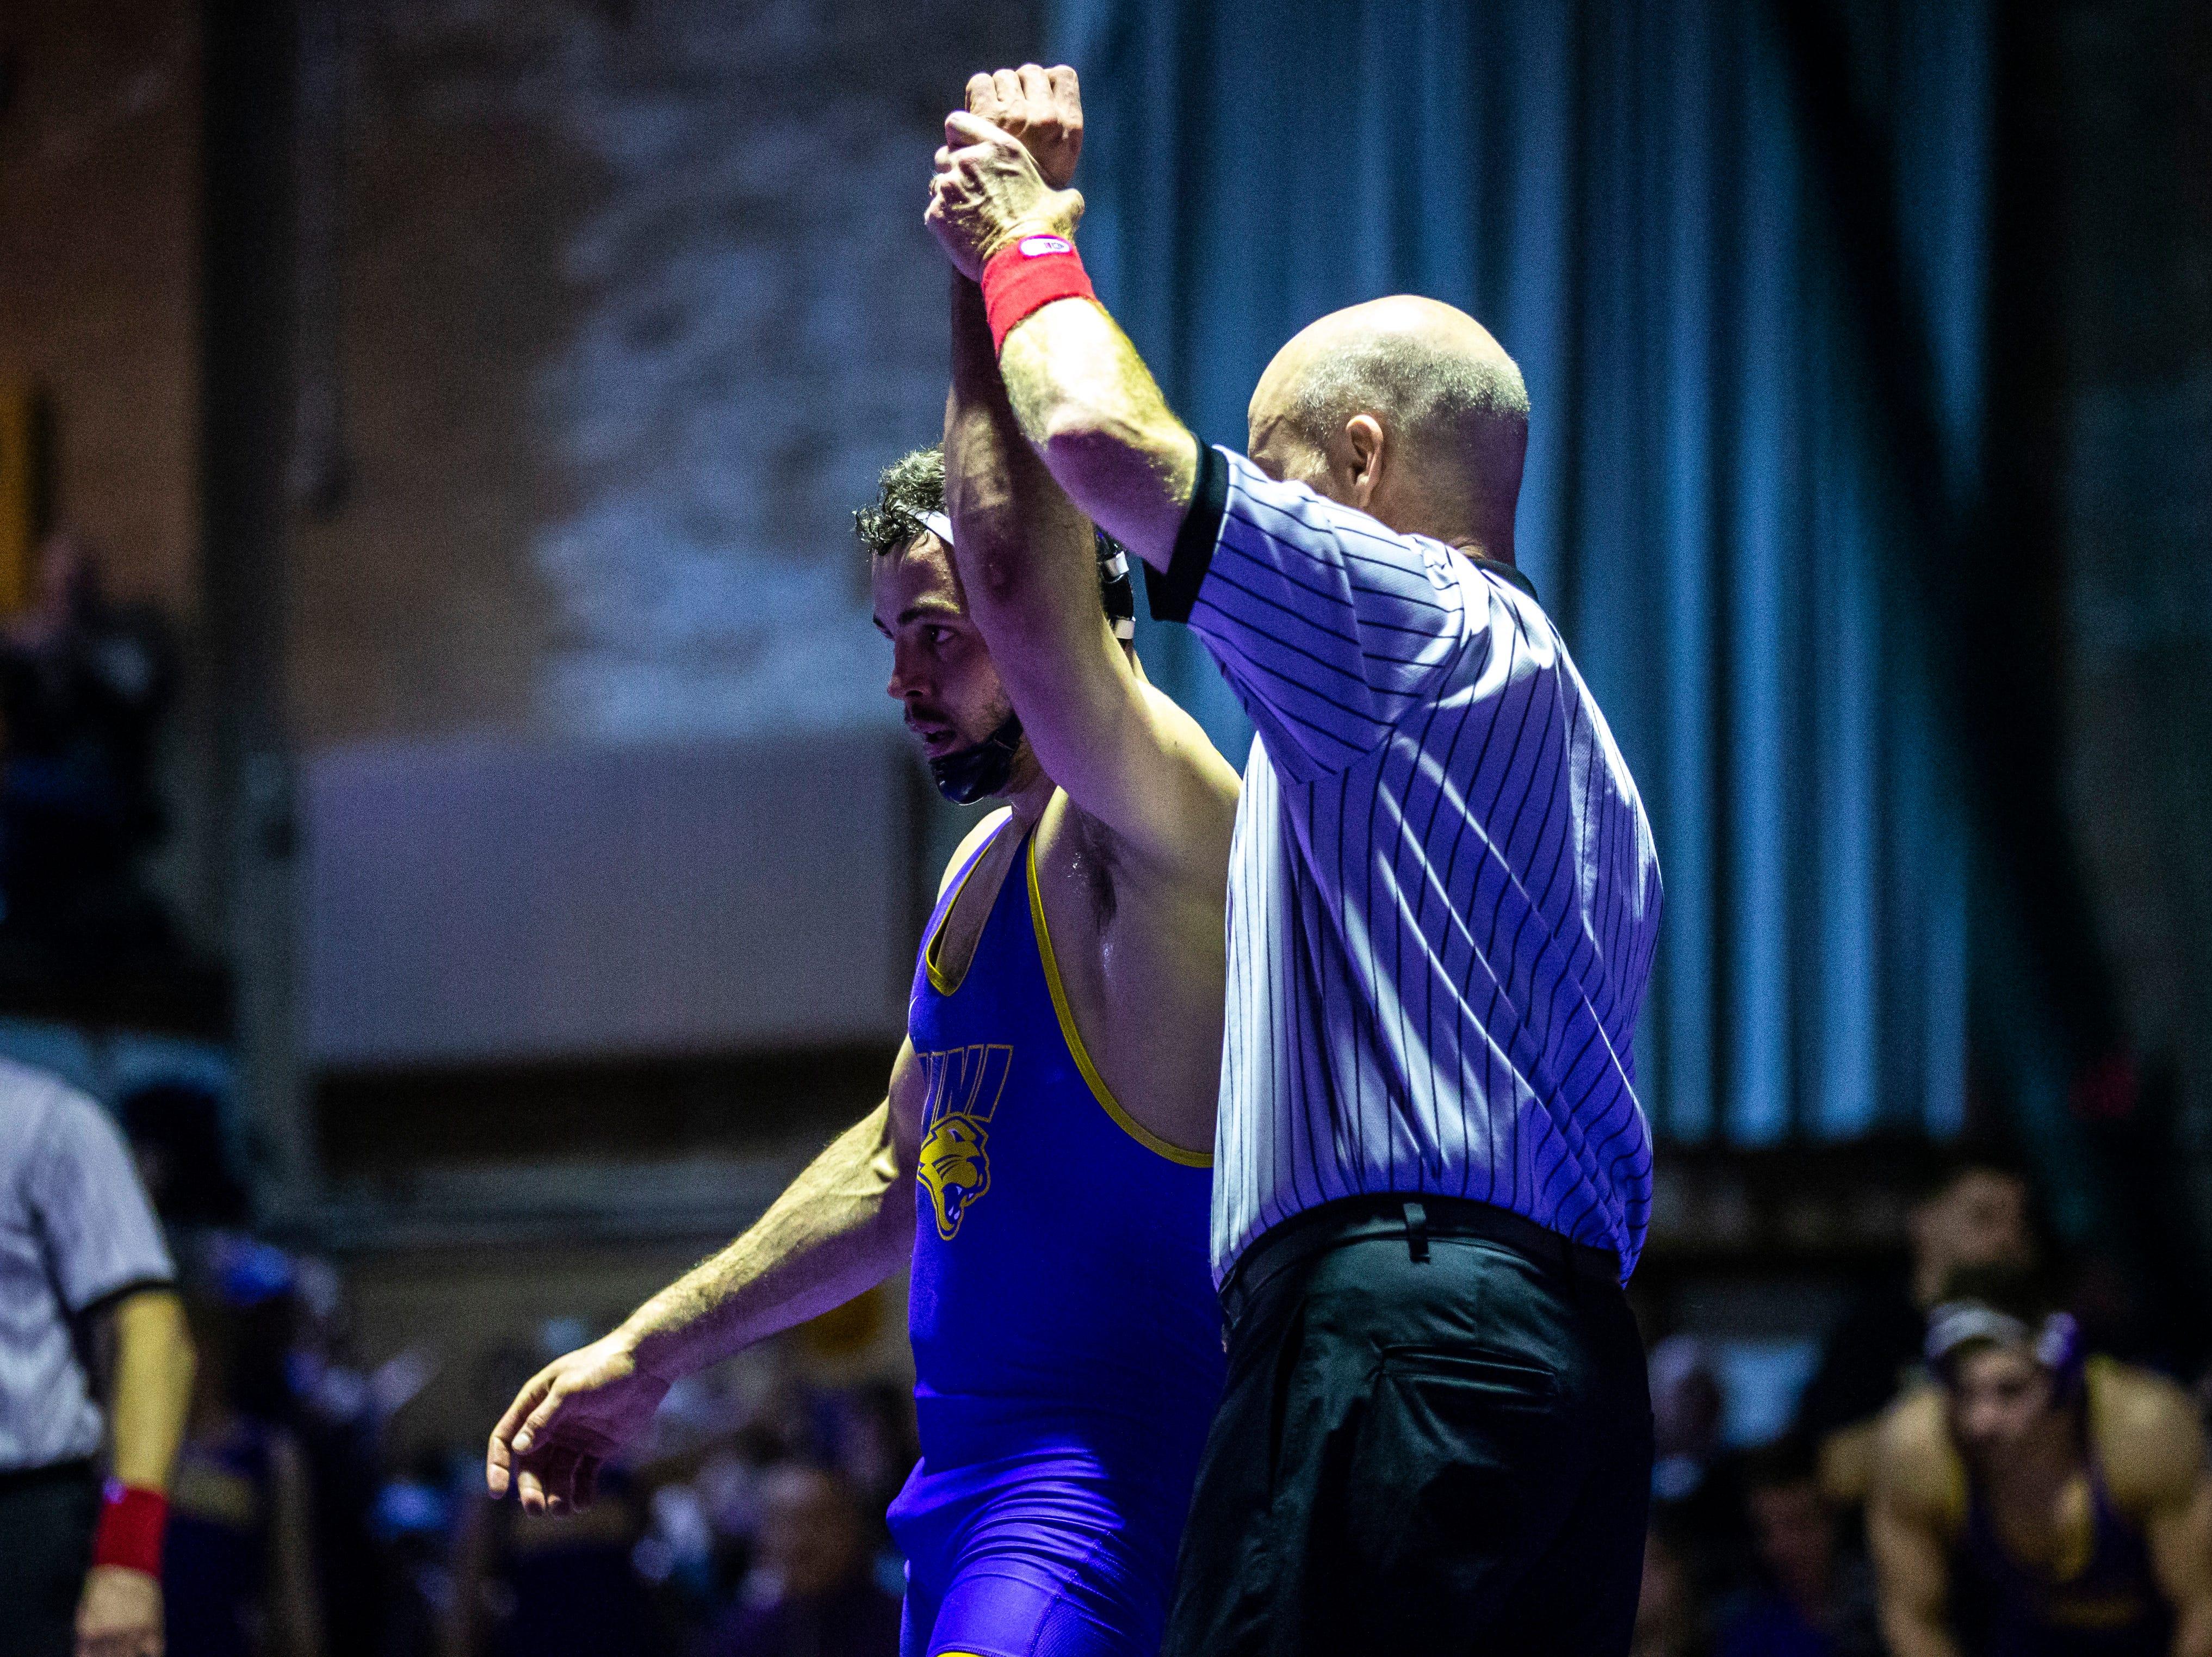 Northern Iowa's Bryce Steiert has his hand raised after wrestling Iowa State's Logan Schumacher at 165 during a NCAA Big 12 wrestling dual on Thursday, Feb. 21, 2019 at the West Gymnasium in Cedar Falls, Iowa.